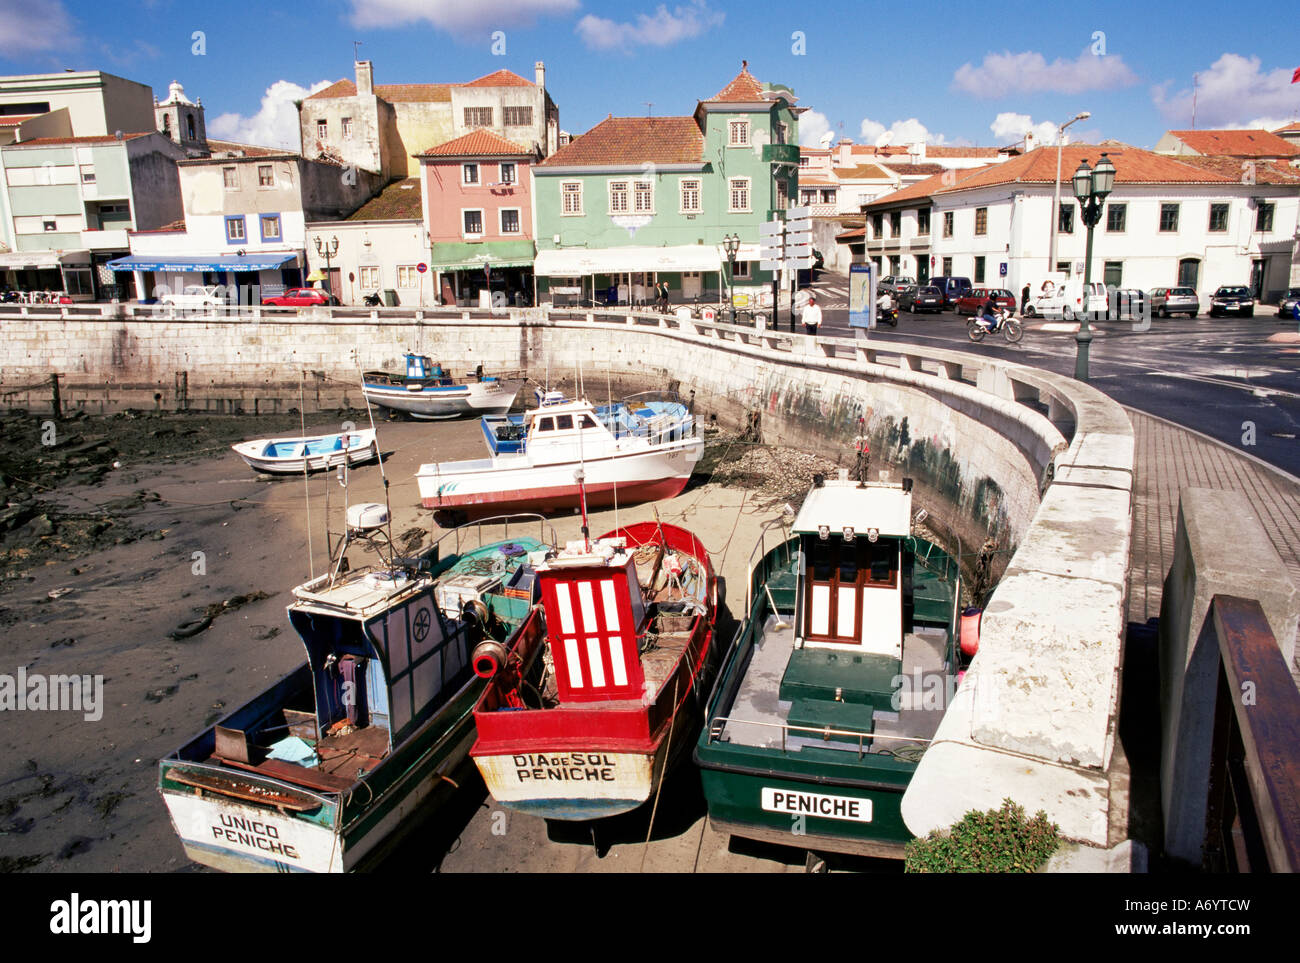 Fishing boats at low tide Peniche Estremadura Portugal Europe - Stock Image